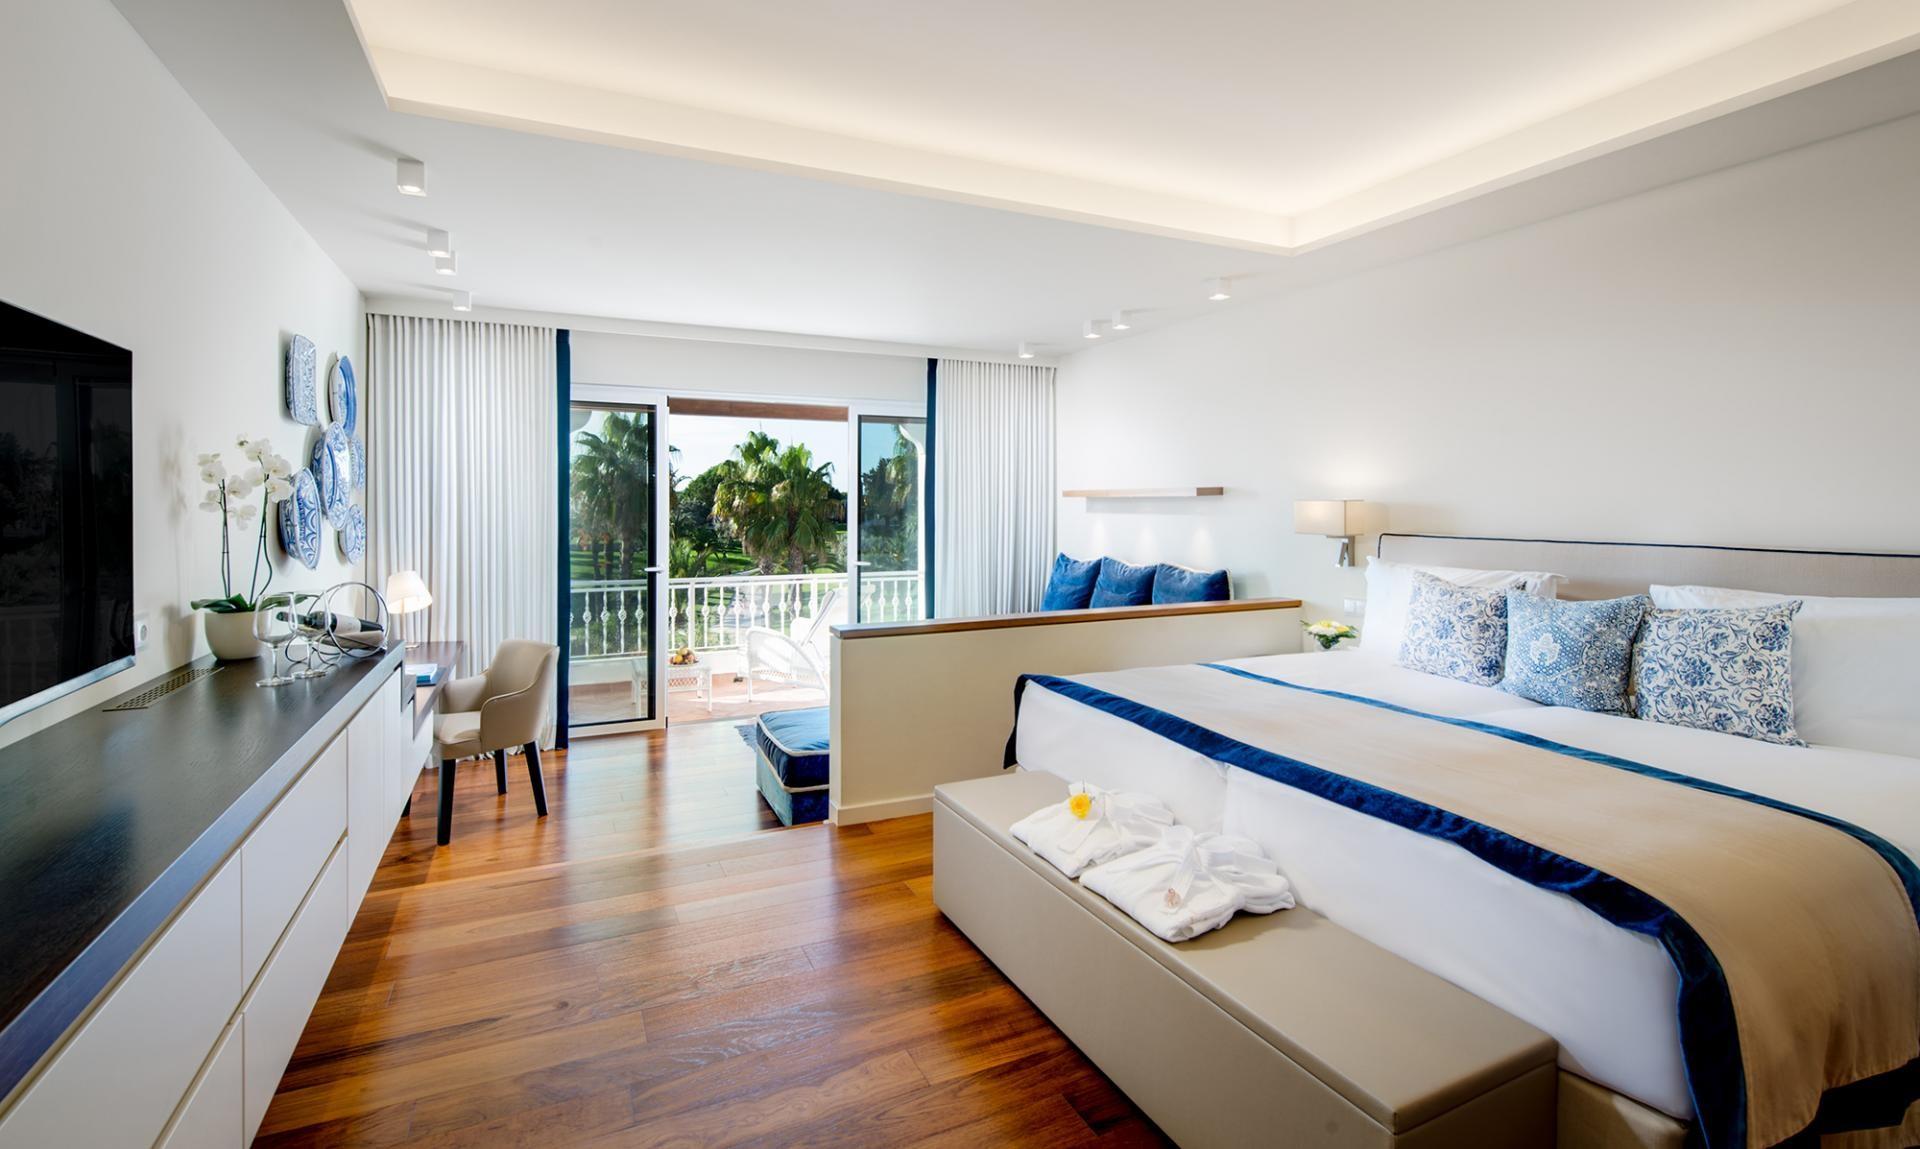 Vila Vita Parc 2 vila vita parc Vila Vita Parc: Get a behind the scenes look of a luxury hotel Vila Vita Parc 2